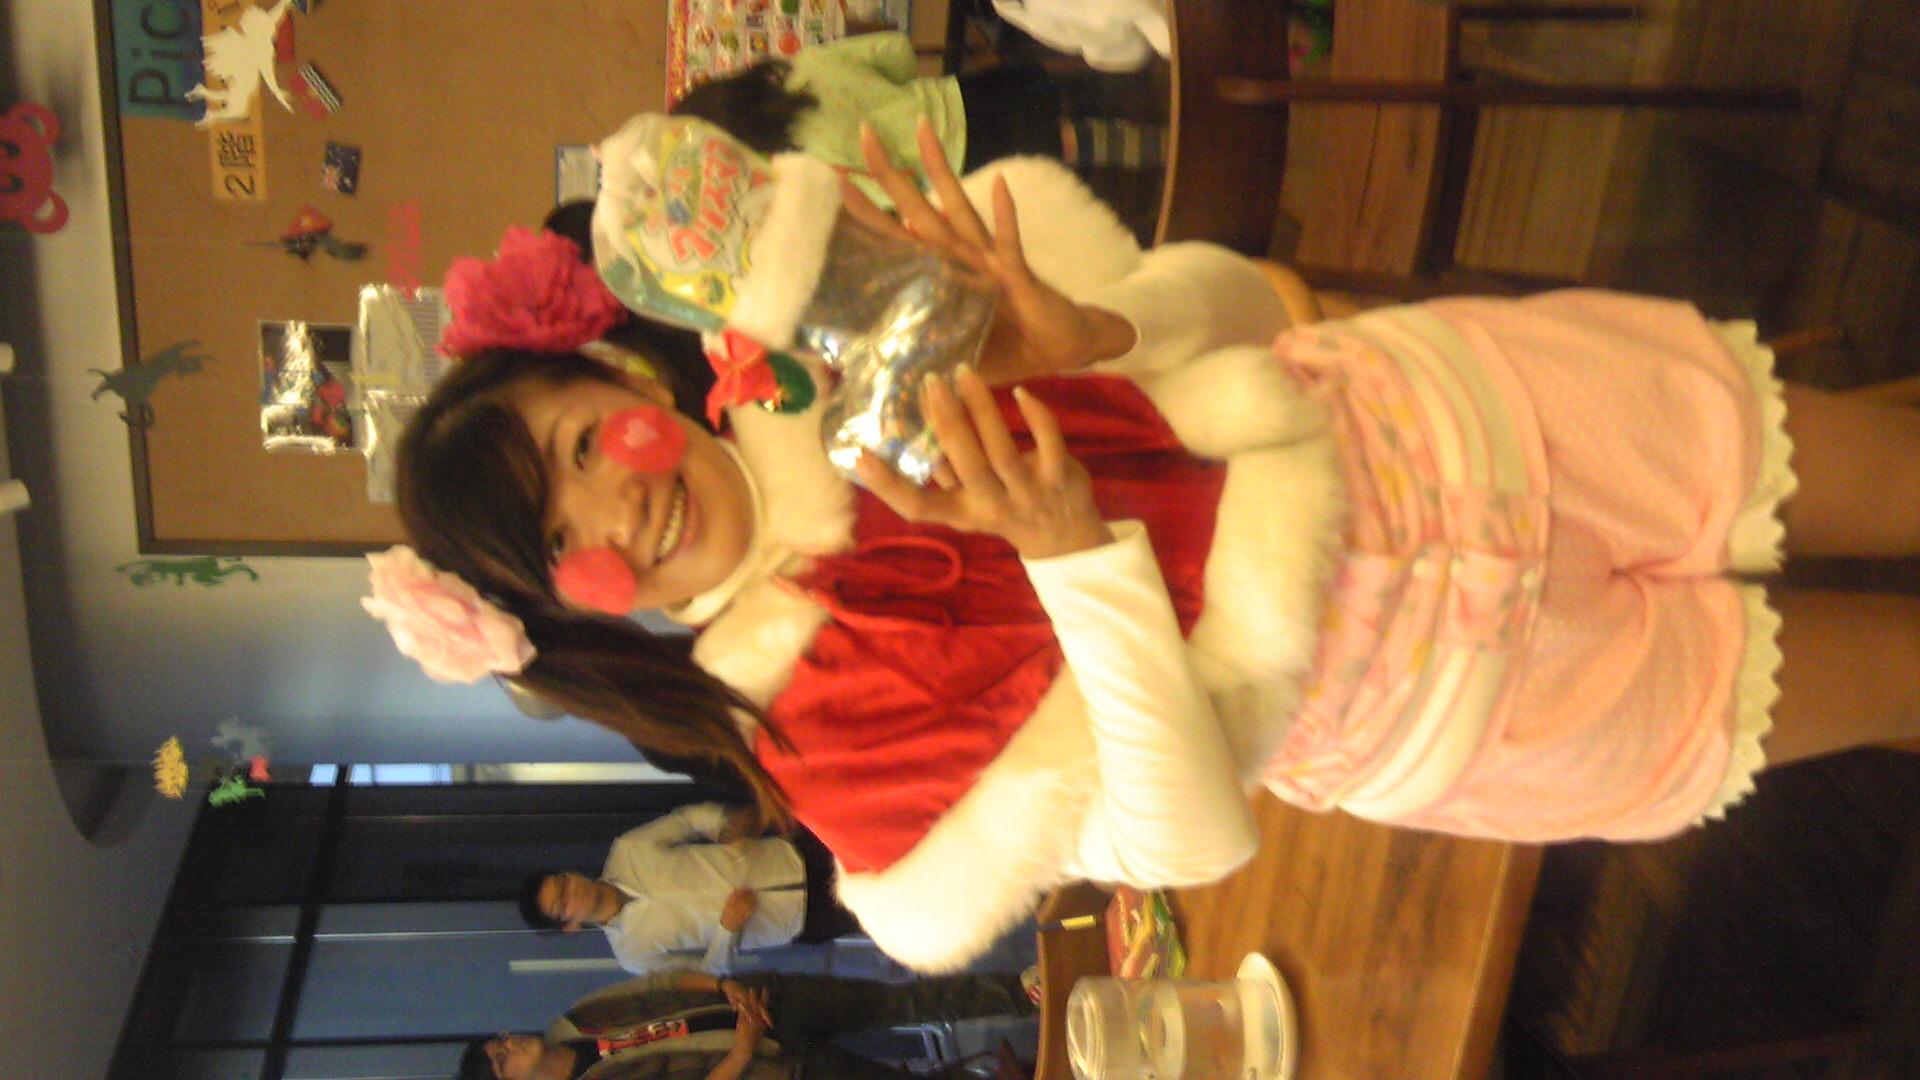 Merry Merry Christmas!! 素敵なクリスマスを☆☆☆ from ウサリー ̄(=∵=) ̄_e0142585_11163775.jpg